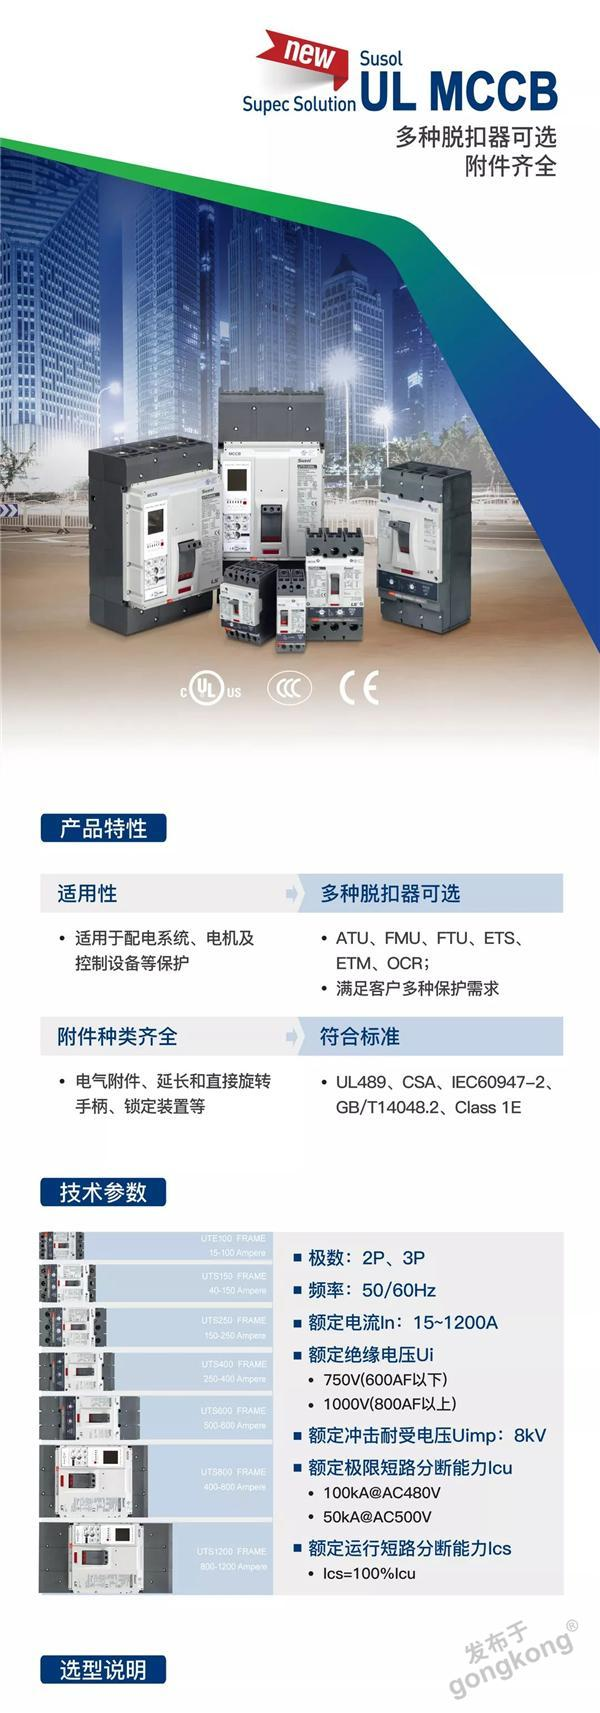 特惠现货KFD2-STC4-Ex1.2O.H